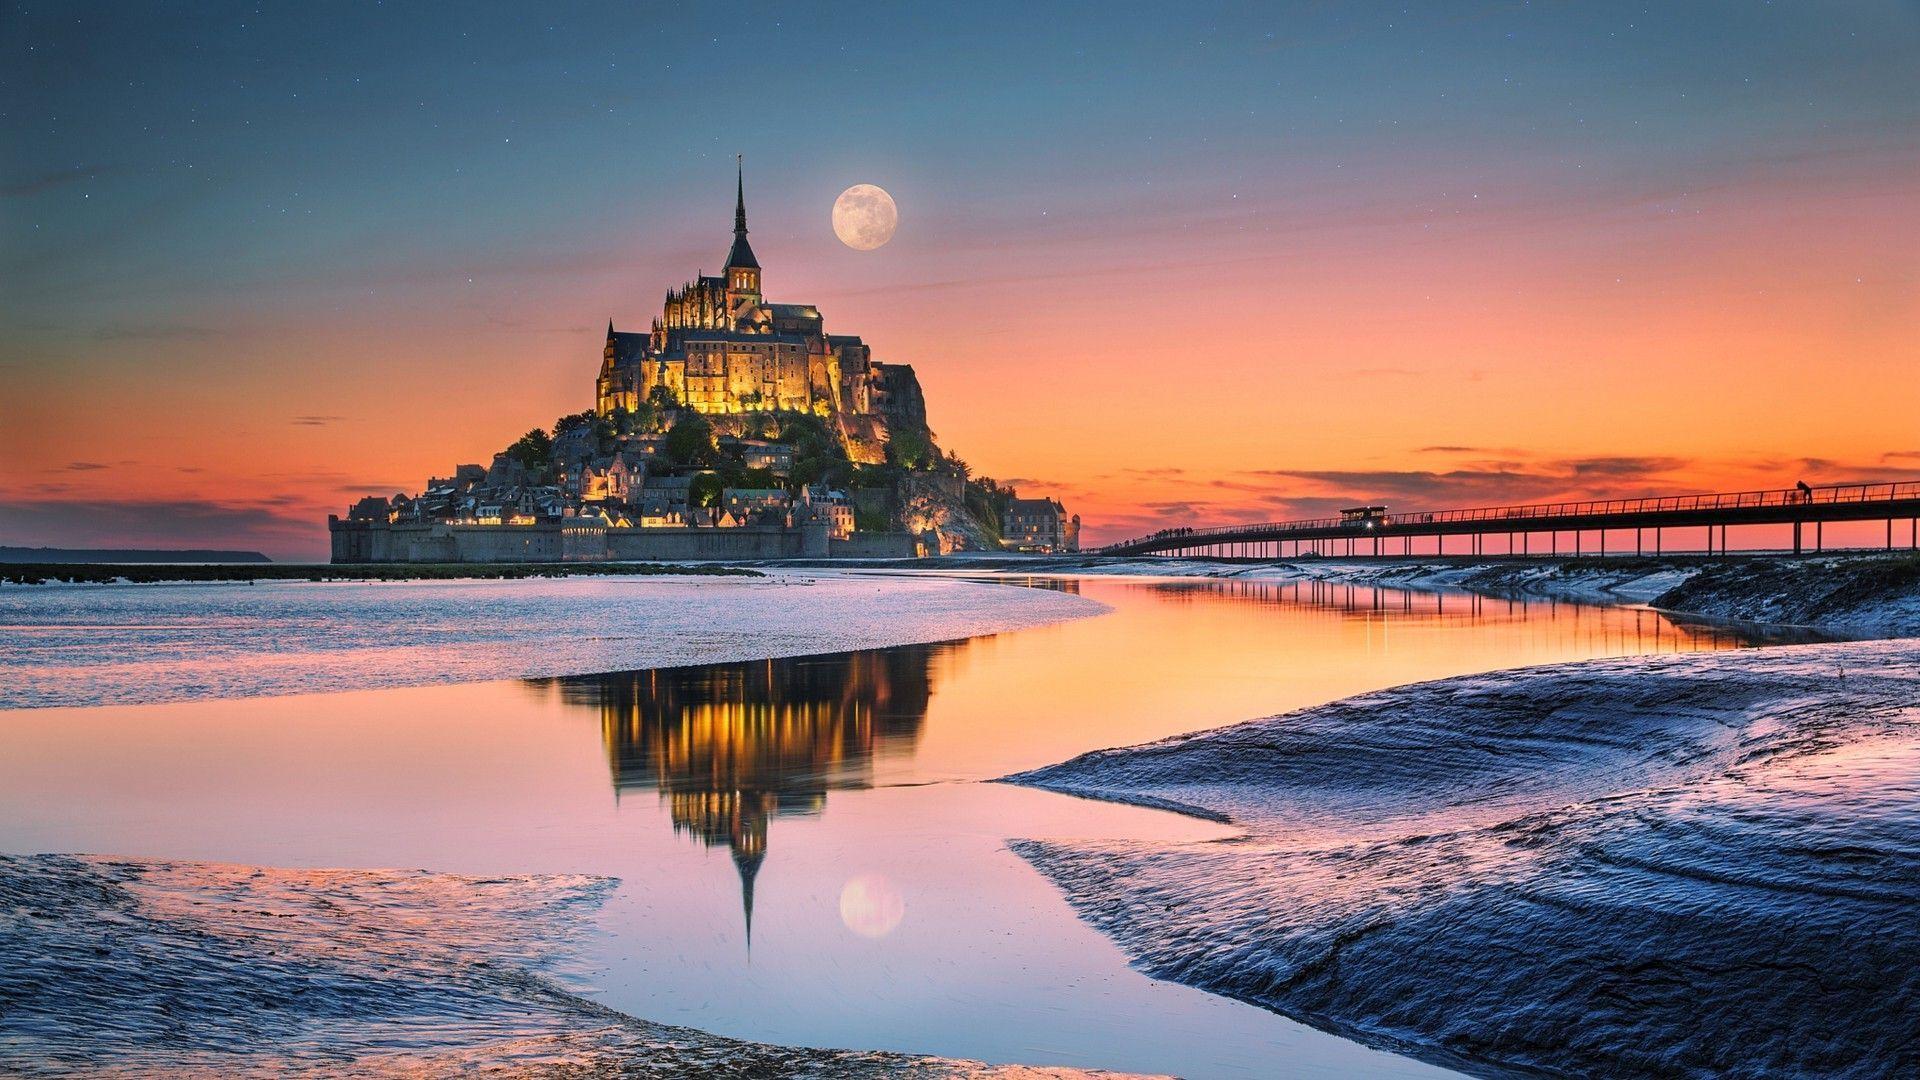 France Landscape Wallpapers Top Free France Landscape Backgrounds Wallpaperaccess